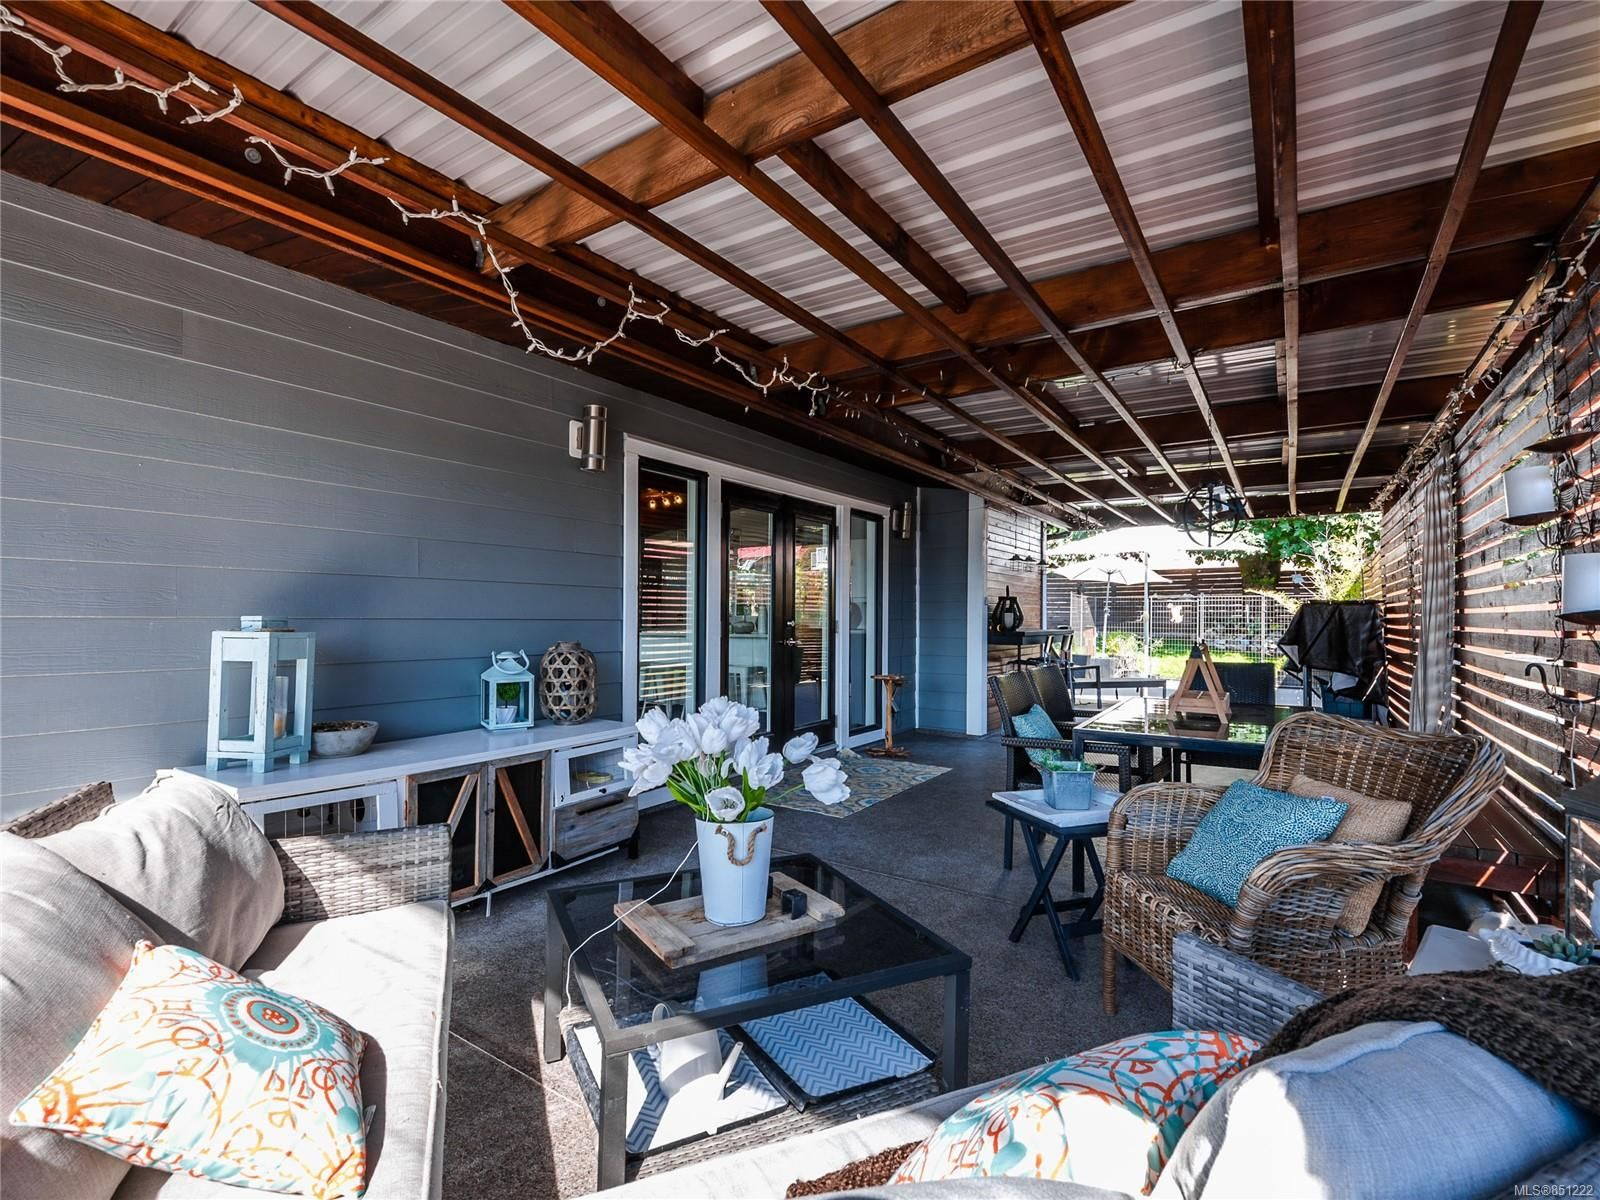 Photo 33: Photos: 2525 11th Ave in : PA Port Alberni House for sale (Port Alberni)  : MLS®# 851222